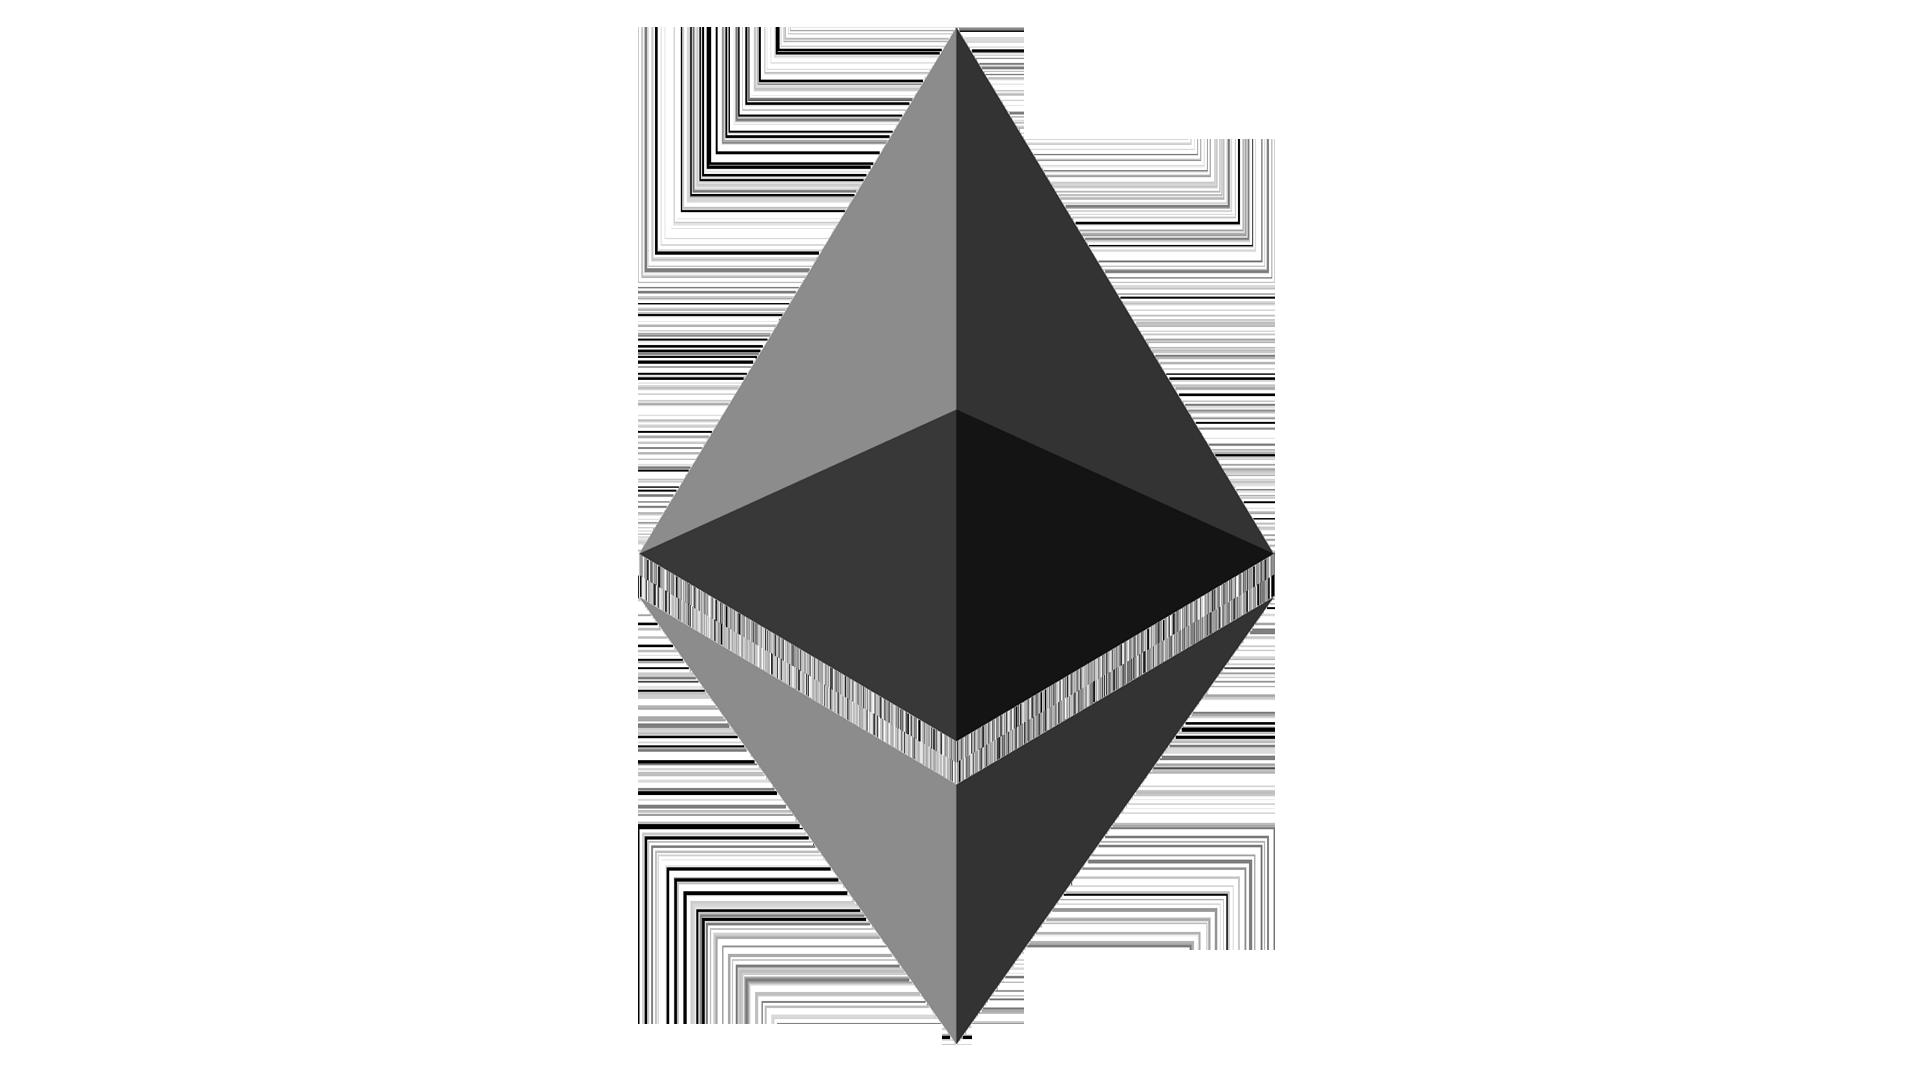 Ethereum Logo, Ethereum Symbol, Meaning, History and Evolution